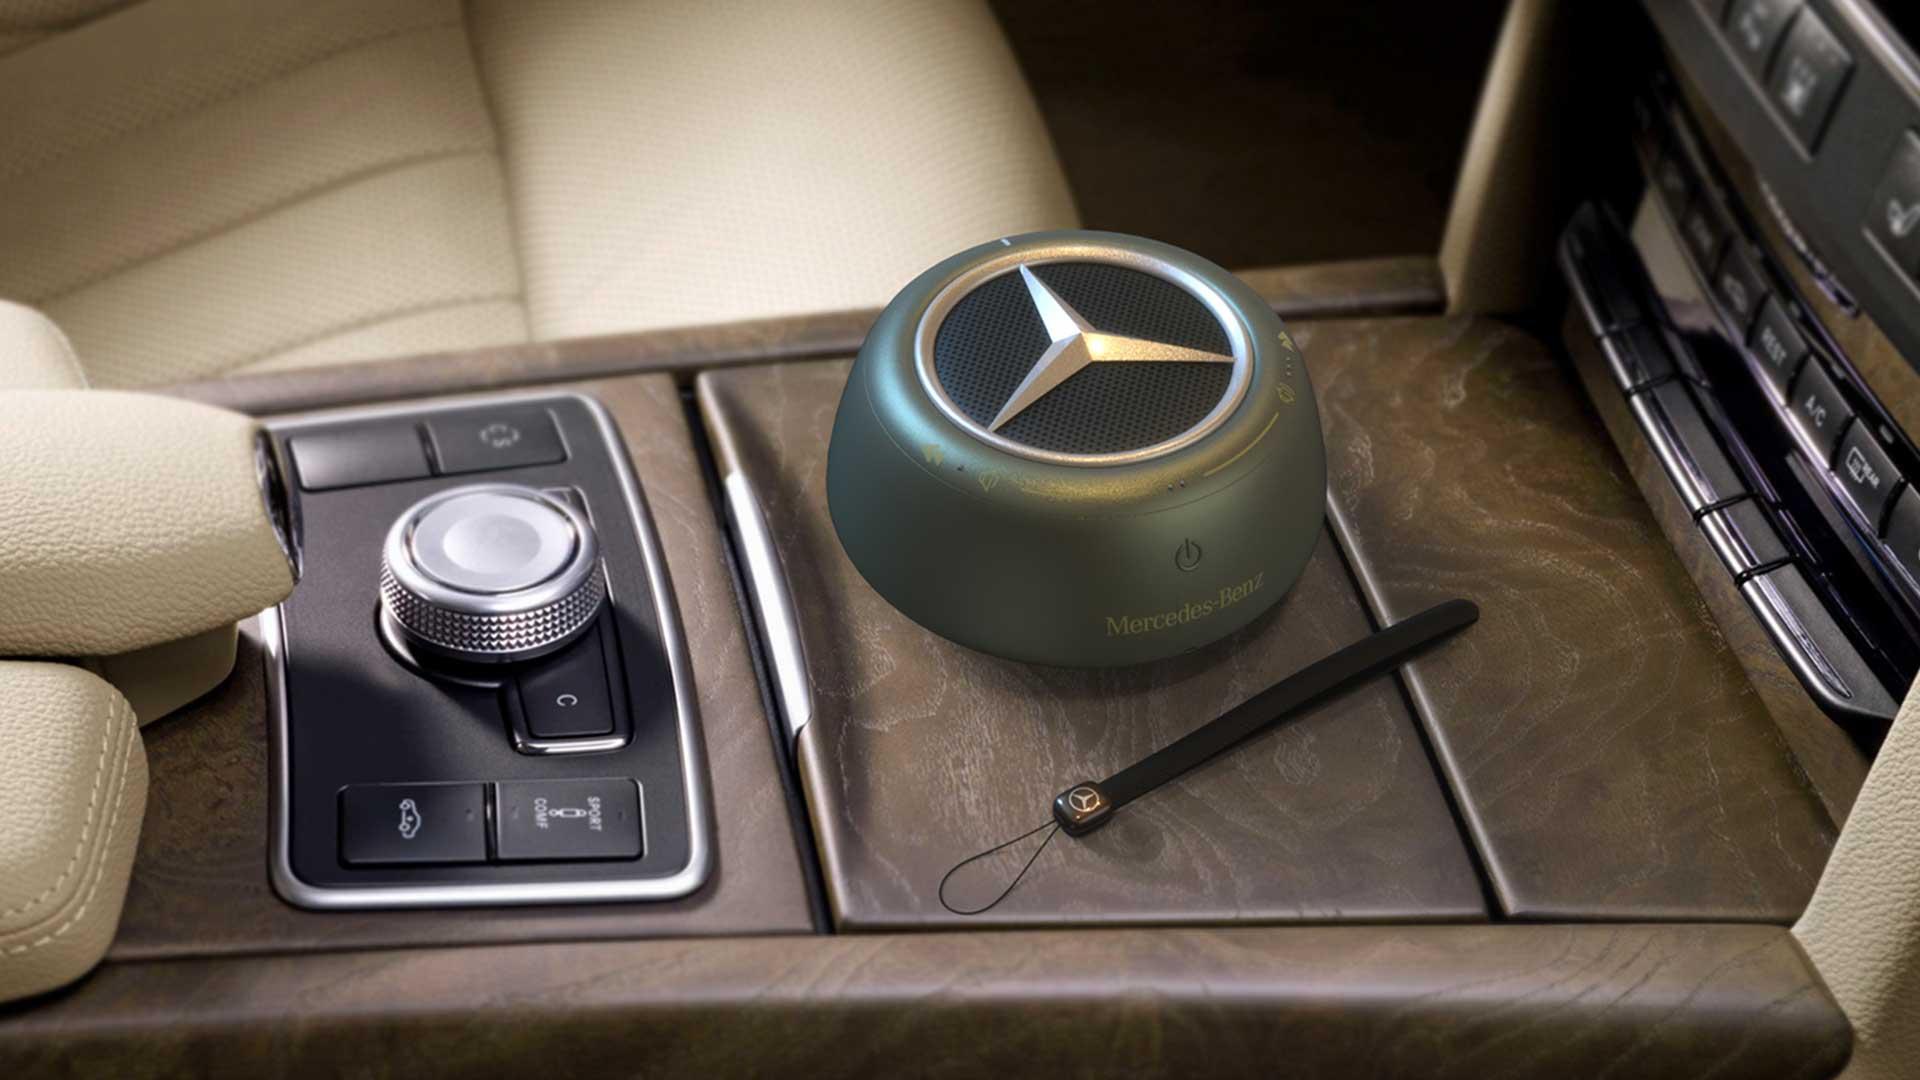 کمپانی مرسدس بنز - لوکس - خودرو